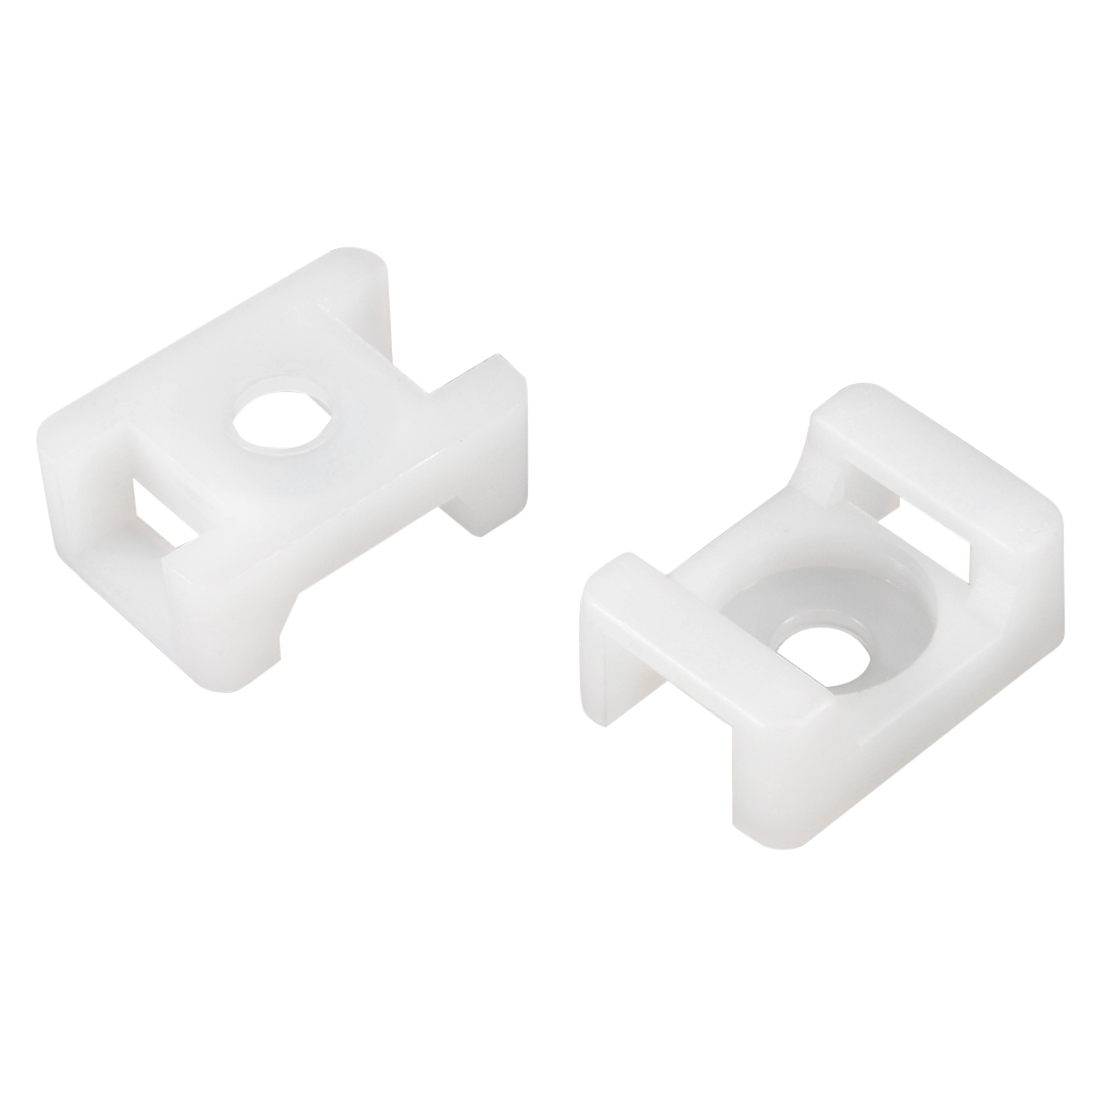 Cable Tie Base Saddle Type Wire Holder Nylon 9mm Hole Width White 26Pcs HC-2S